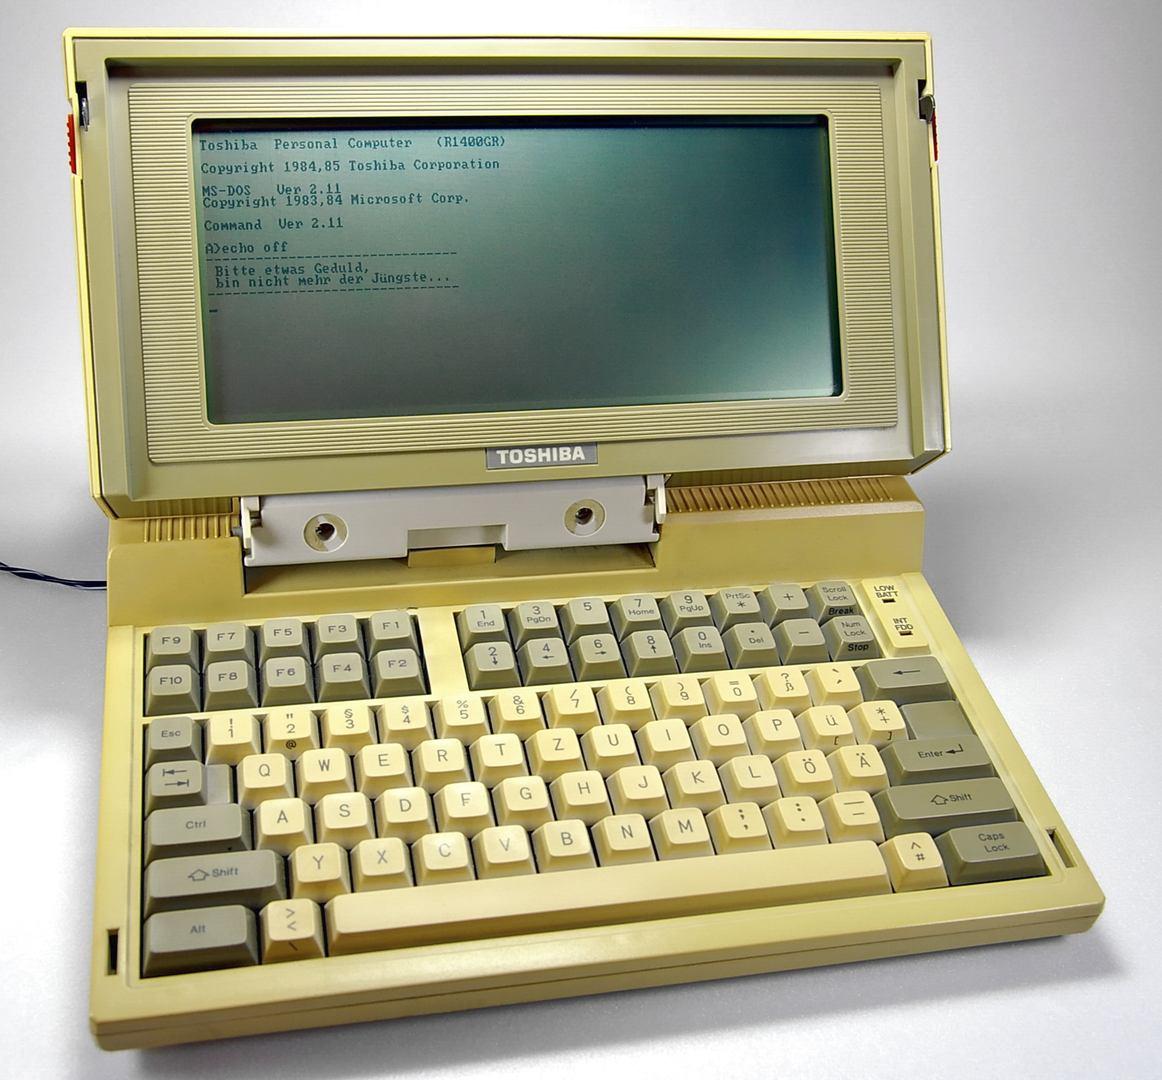 Toshiba T1100, zdroj: Wikimedia Commons, author: Johann H. Addicks